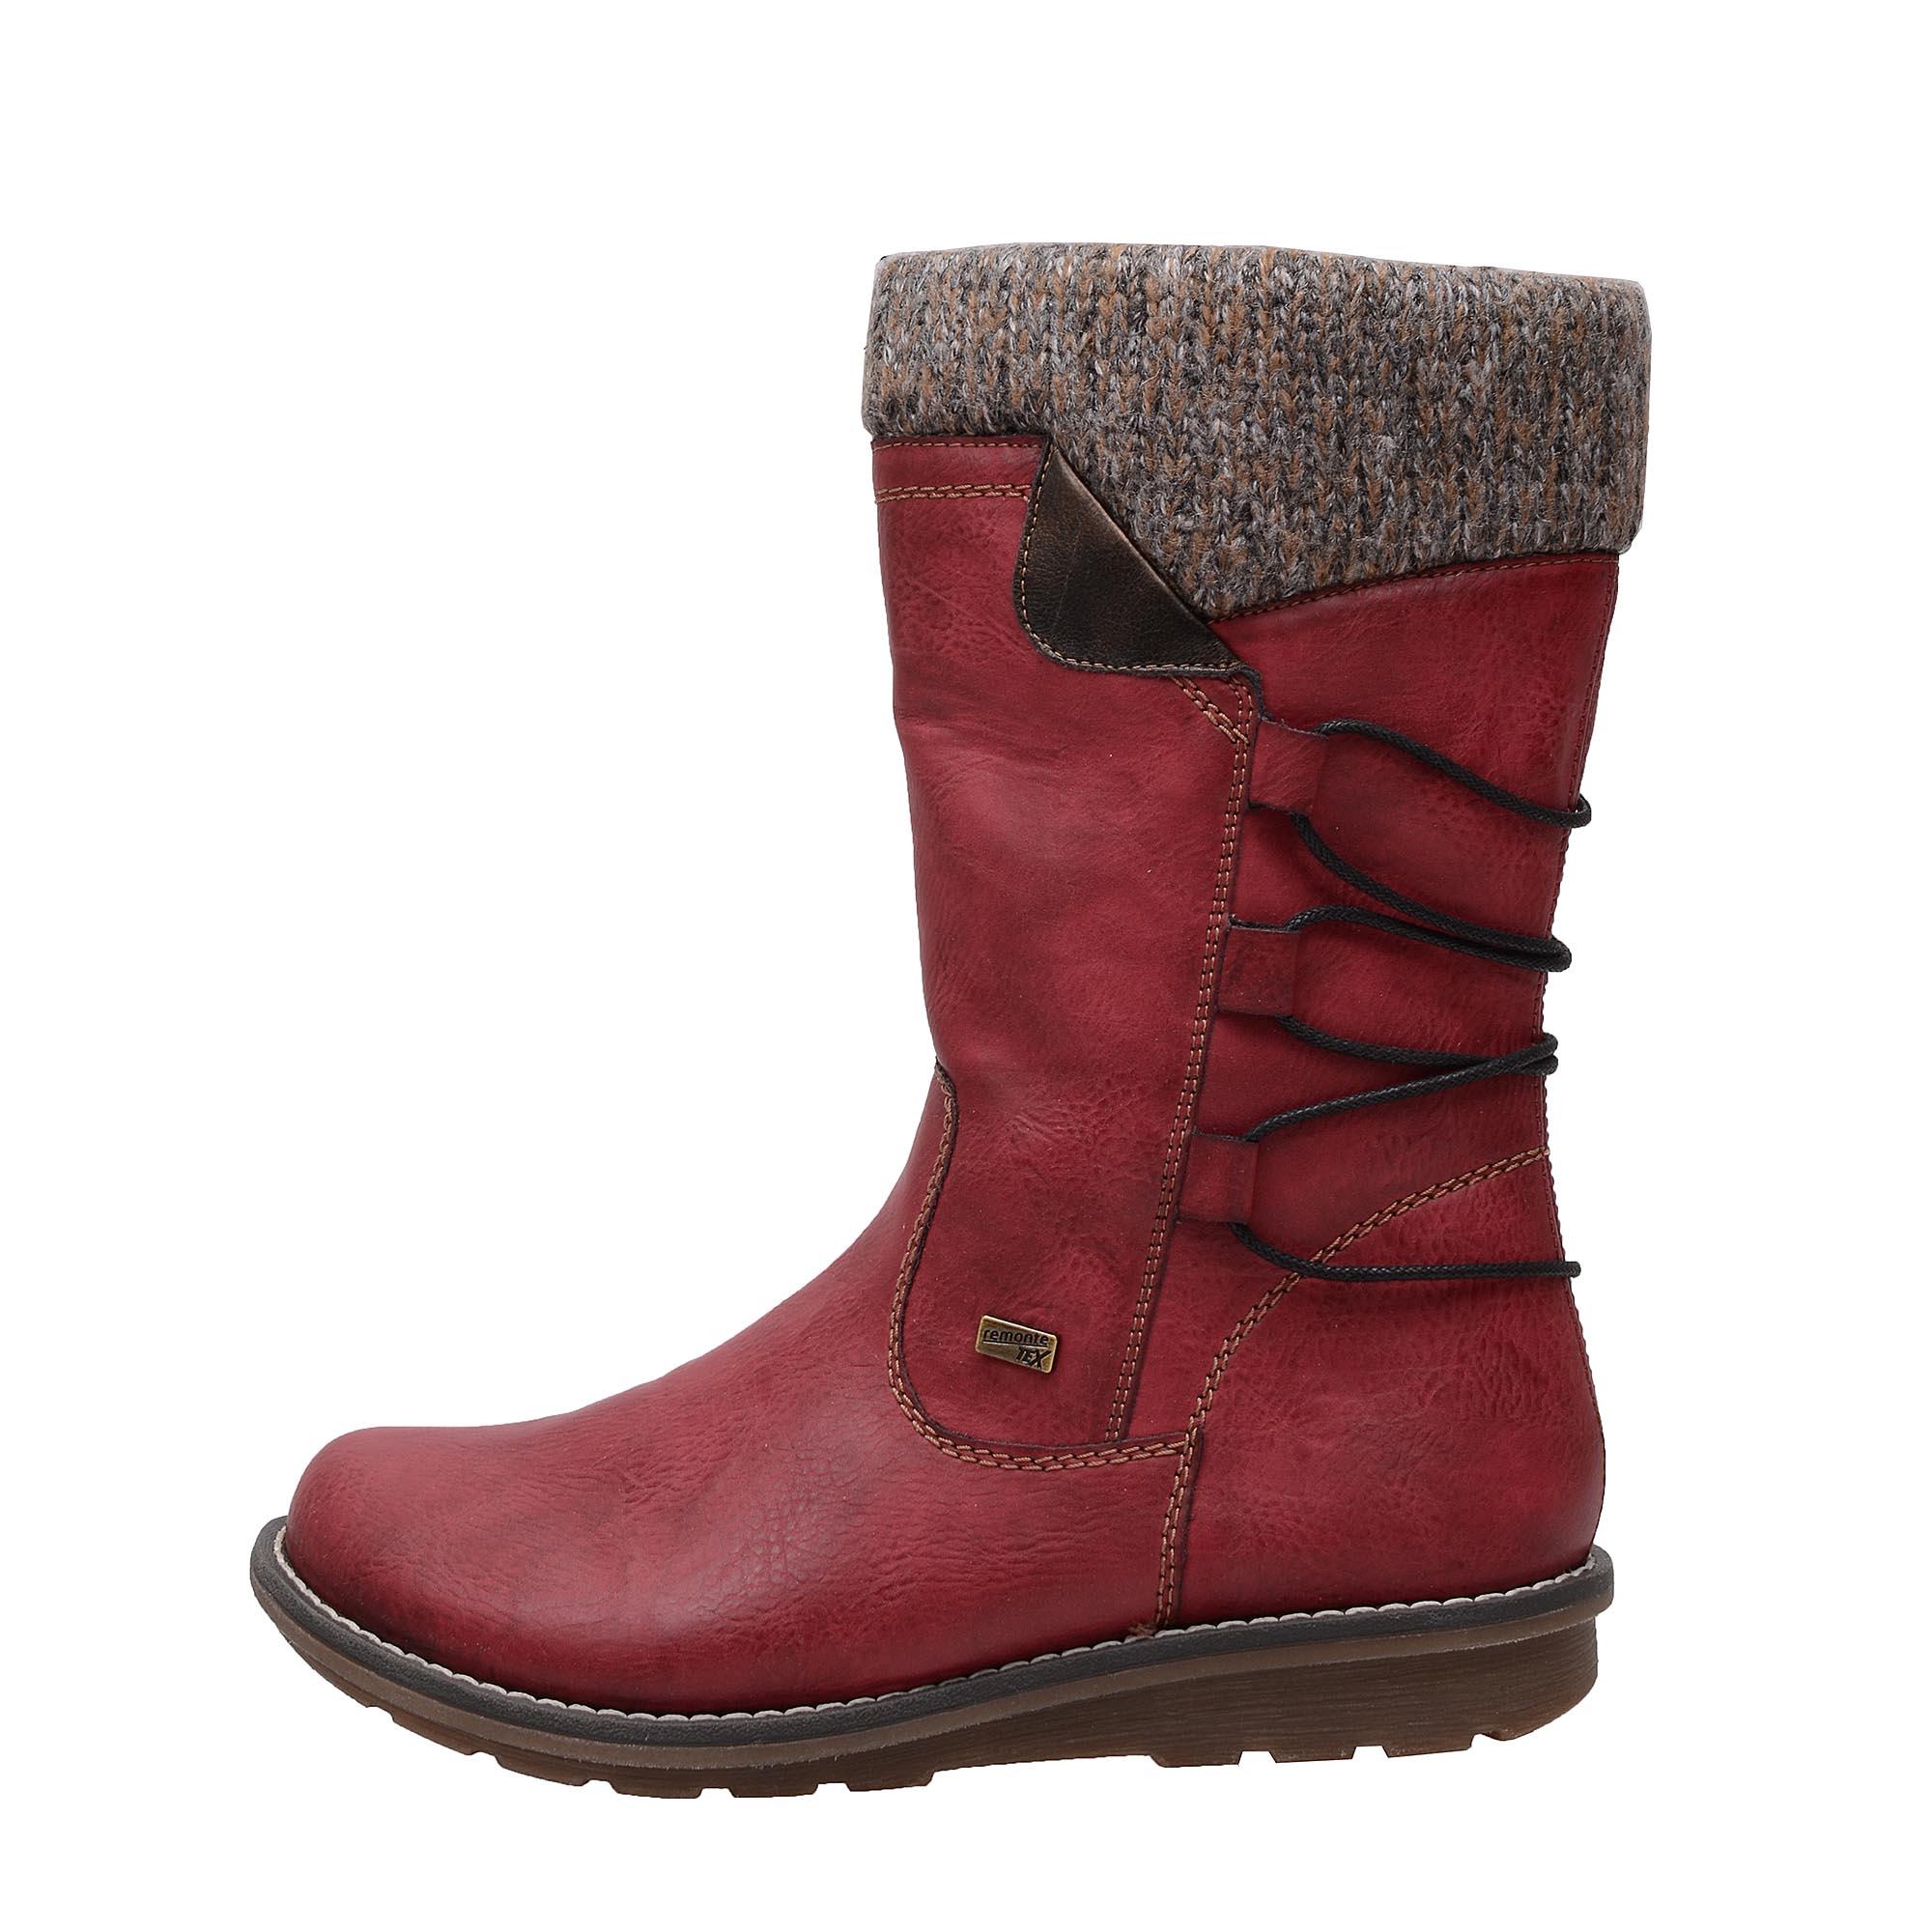 72d04f6c0c detail Dámska obuv RIEKER - REMONTE br R1094 35 ROT KOMBI H